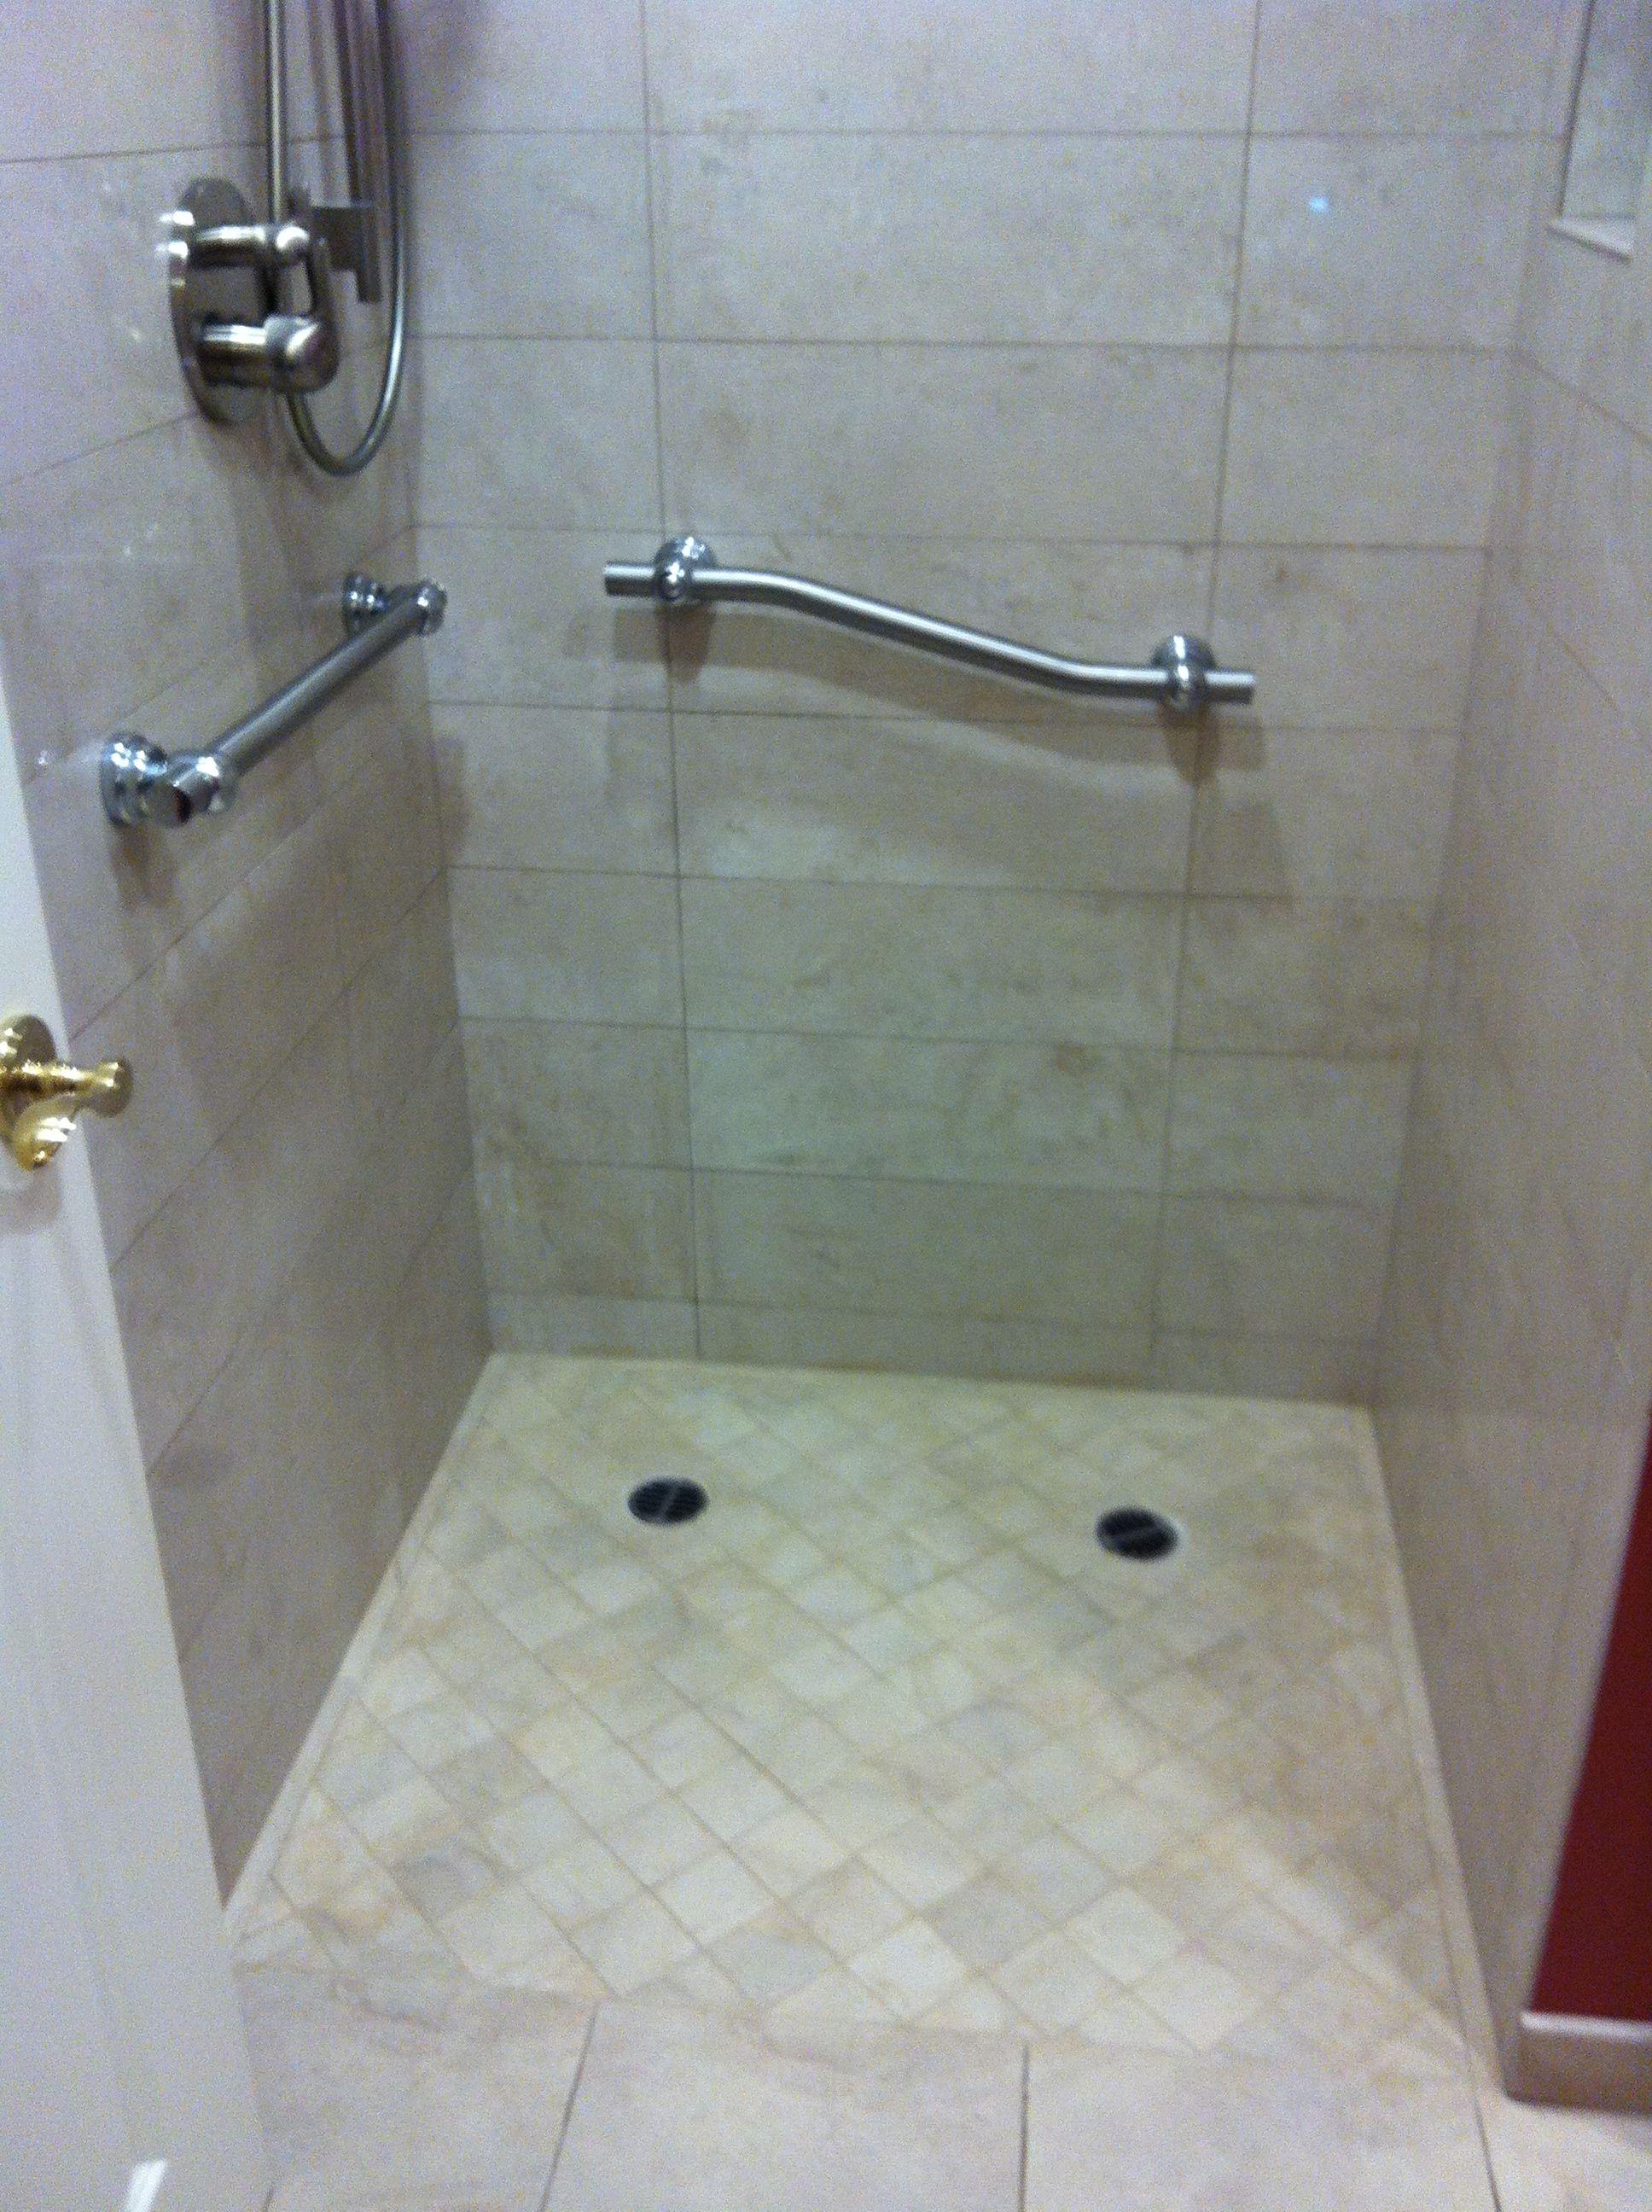 Curbless Shower With Grab Bars Bathroom Ideas Pinterest